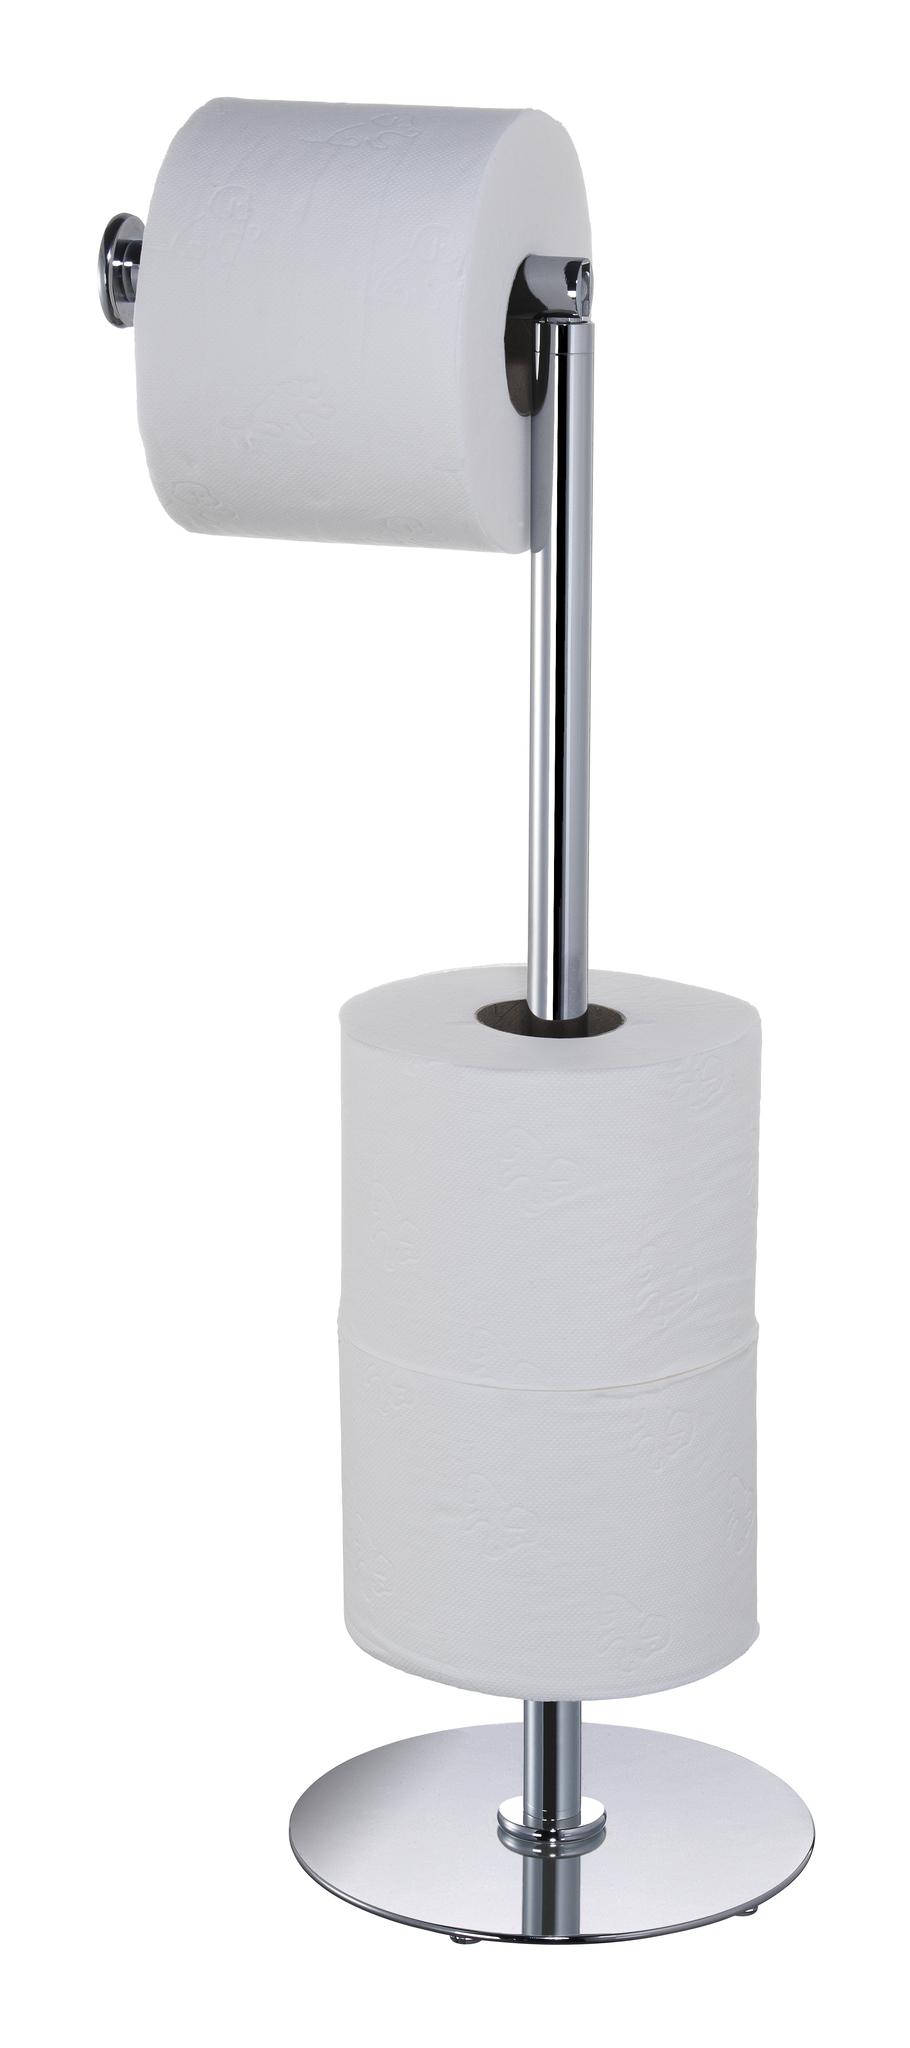 Ванная Стойка для туалета г-образная Windisch 89223CR stoyka-dlya-tualeta-g-obraznaya-89223-ot-windisch-ispaniya-vid.jpg